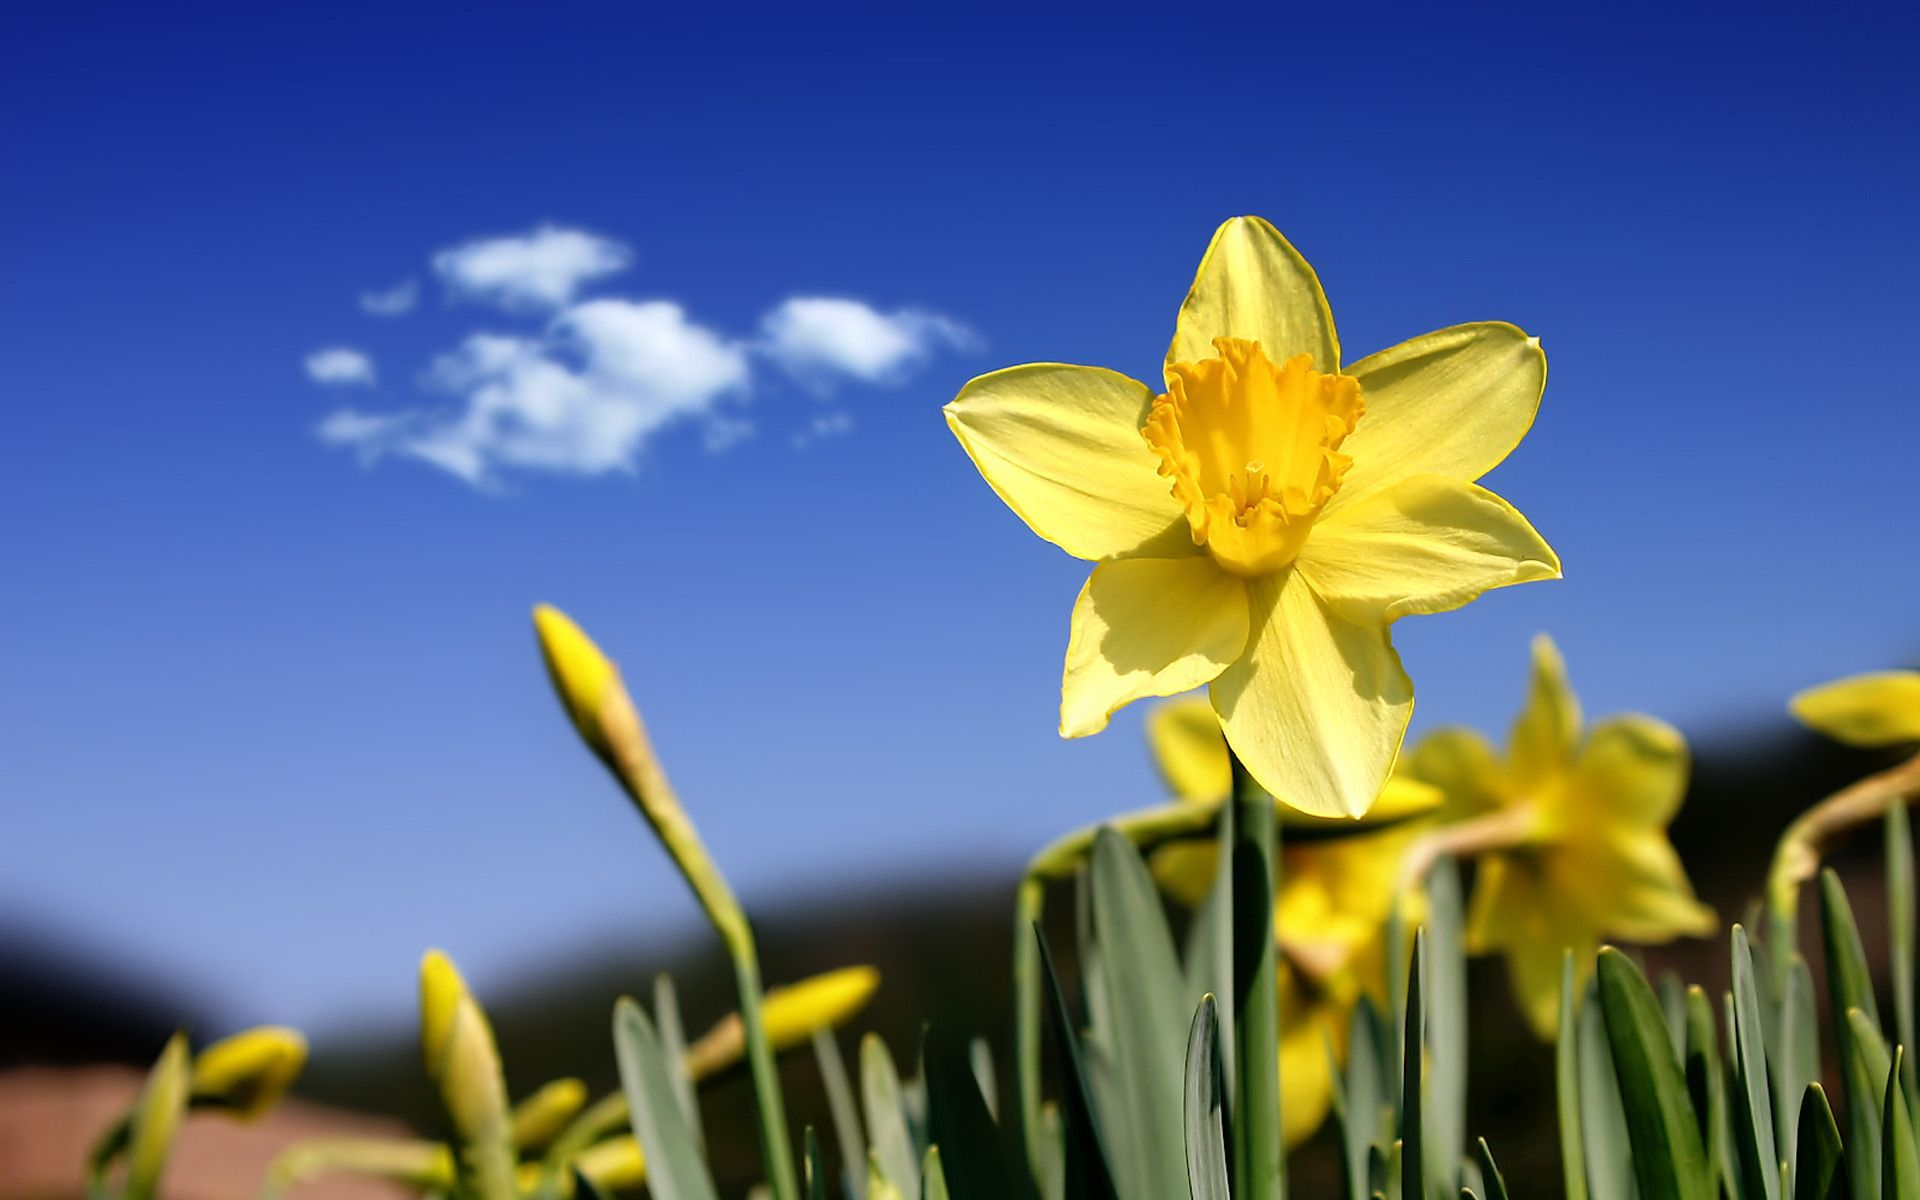 Full Hd 3d Wallpapers 1080p For Mobile Daffodil Wallpaper Free Download Pixelstalk Net